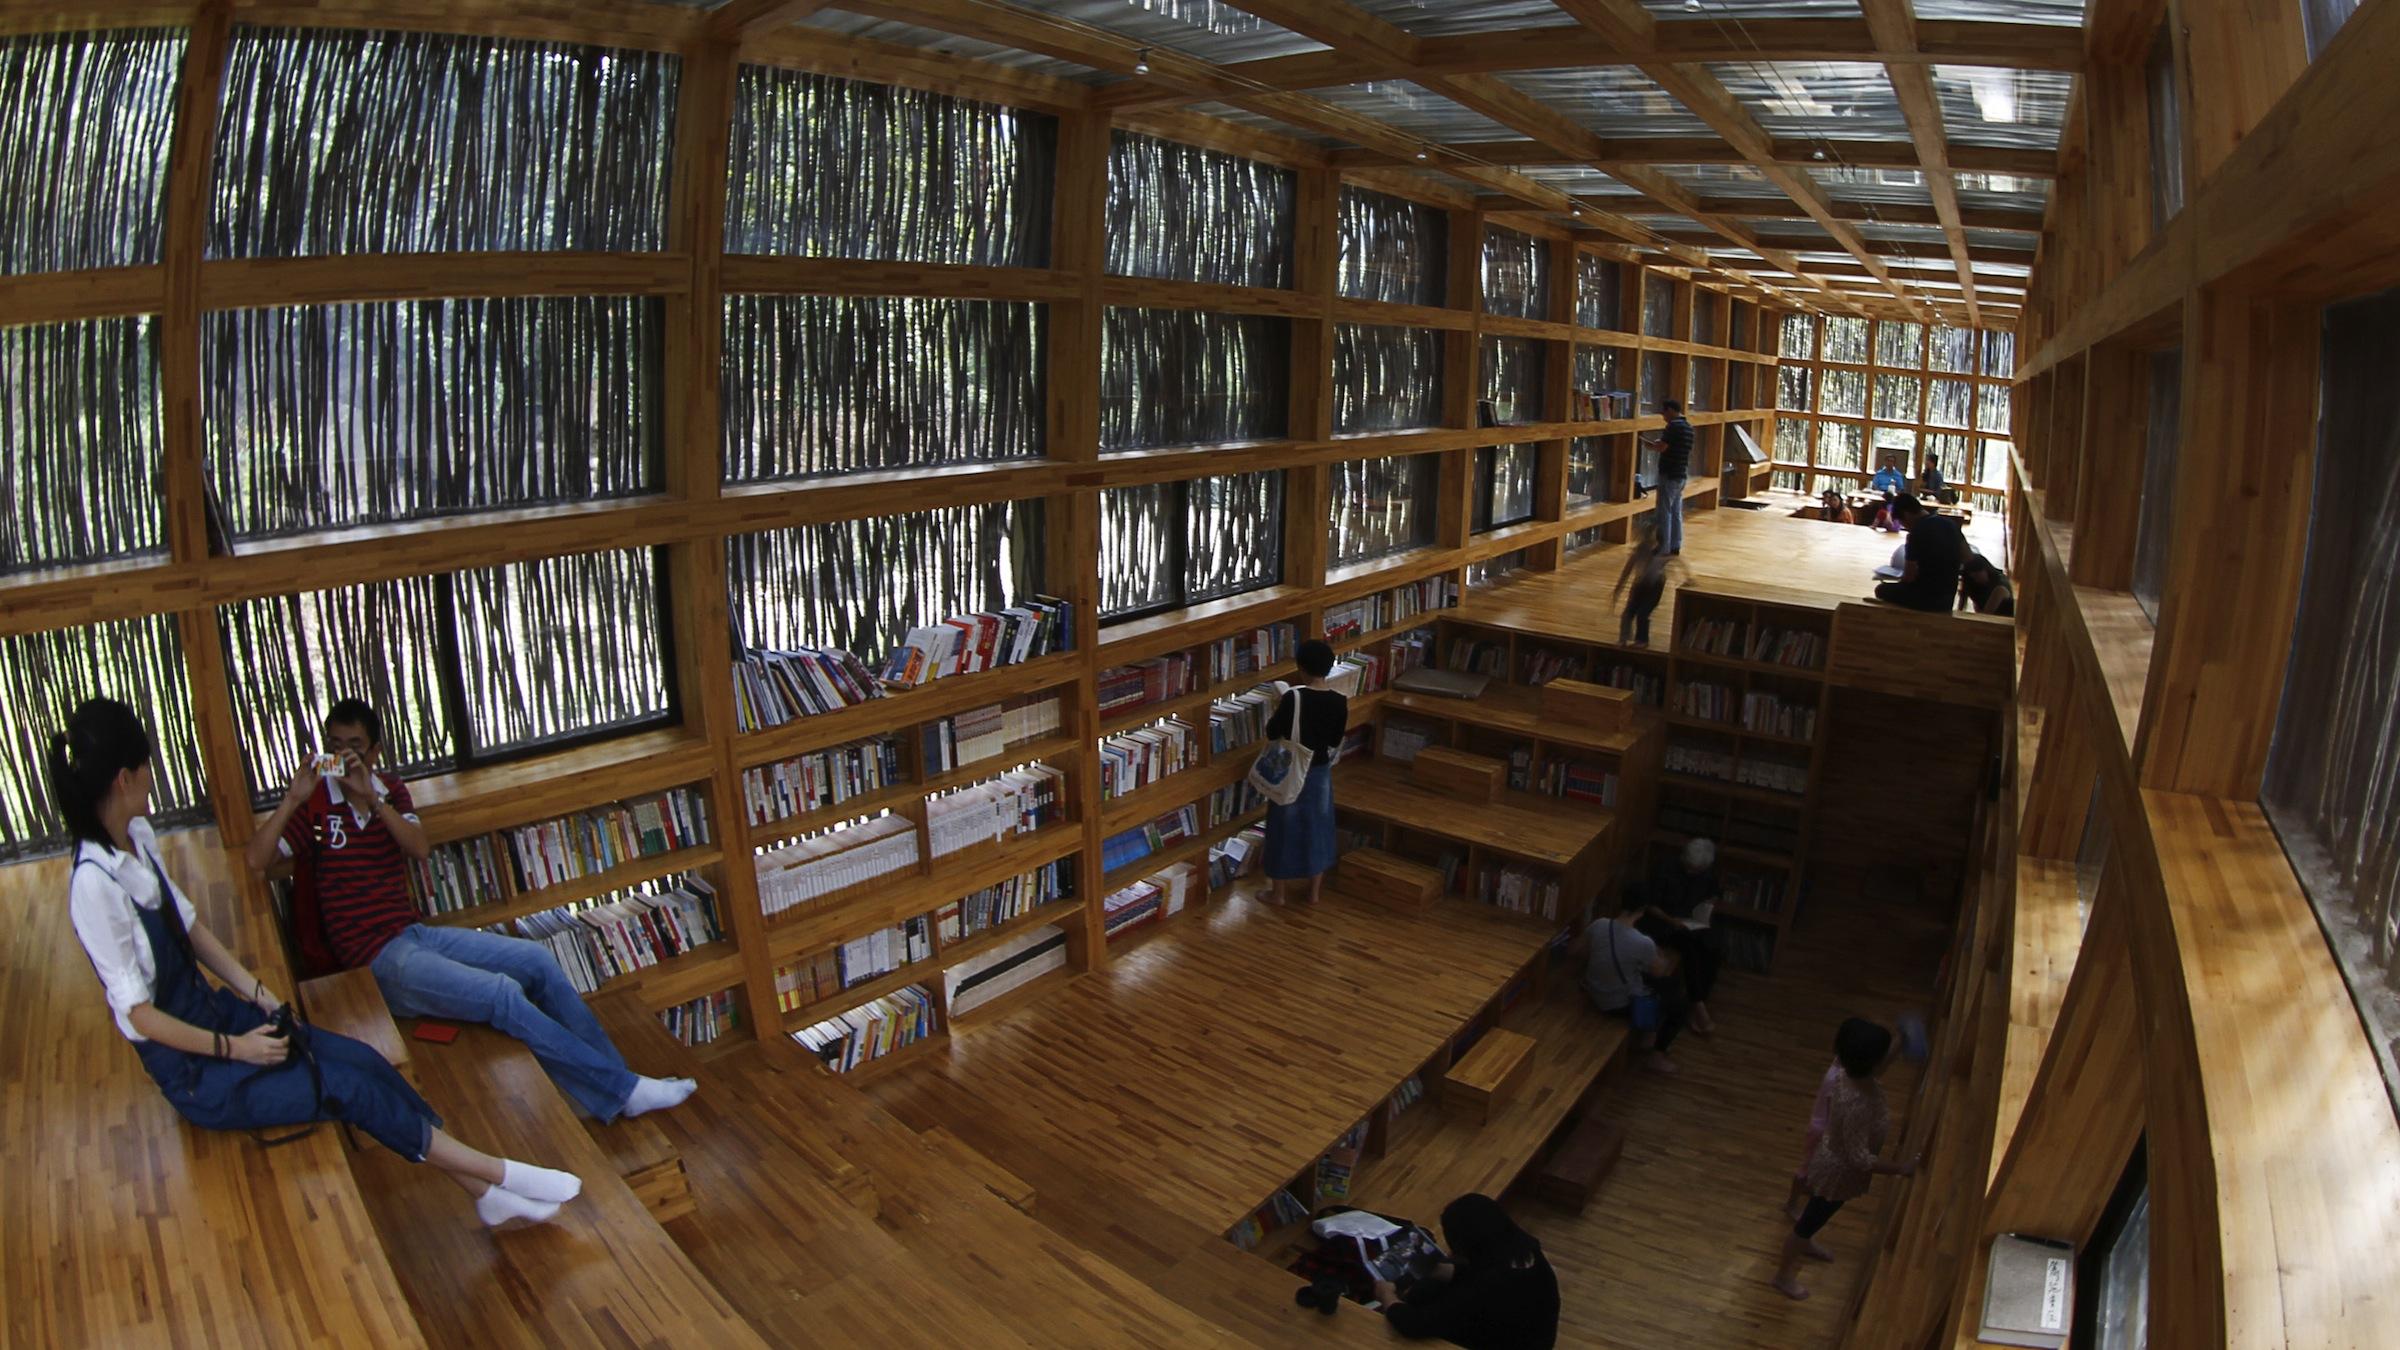 Liyuan Library in Beijing.